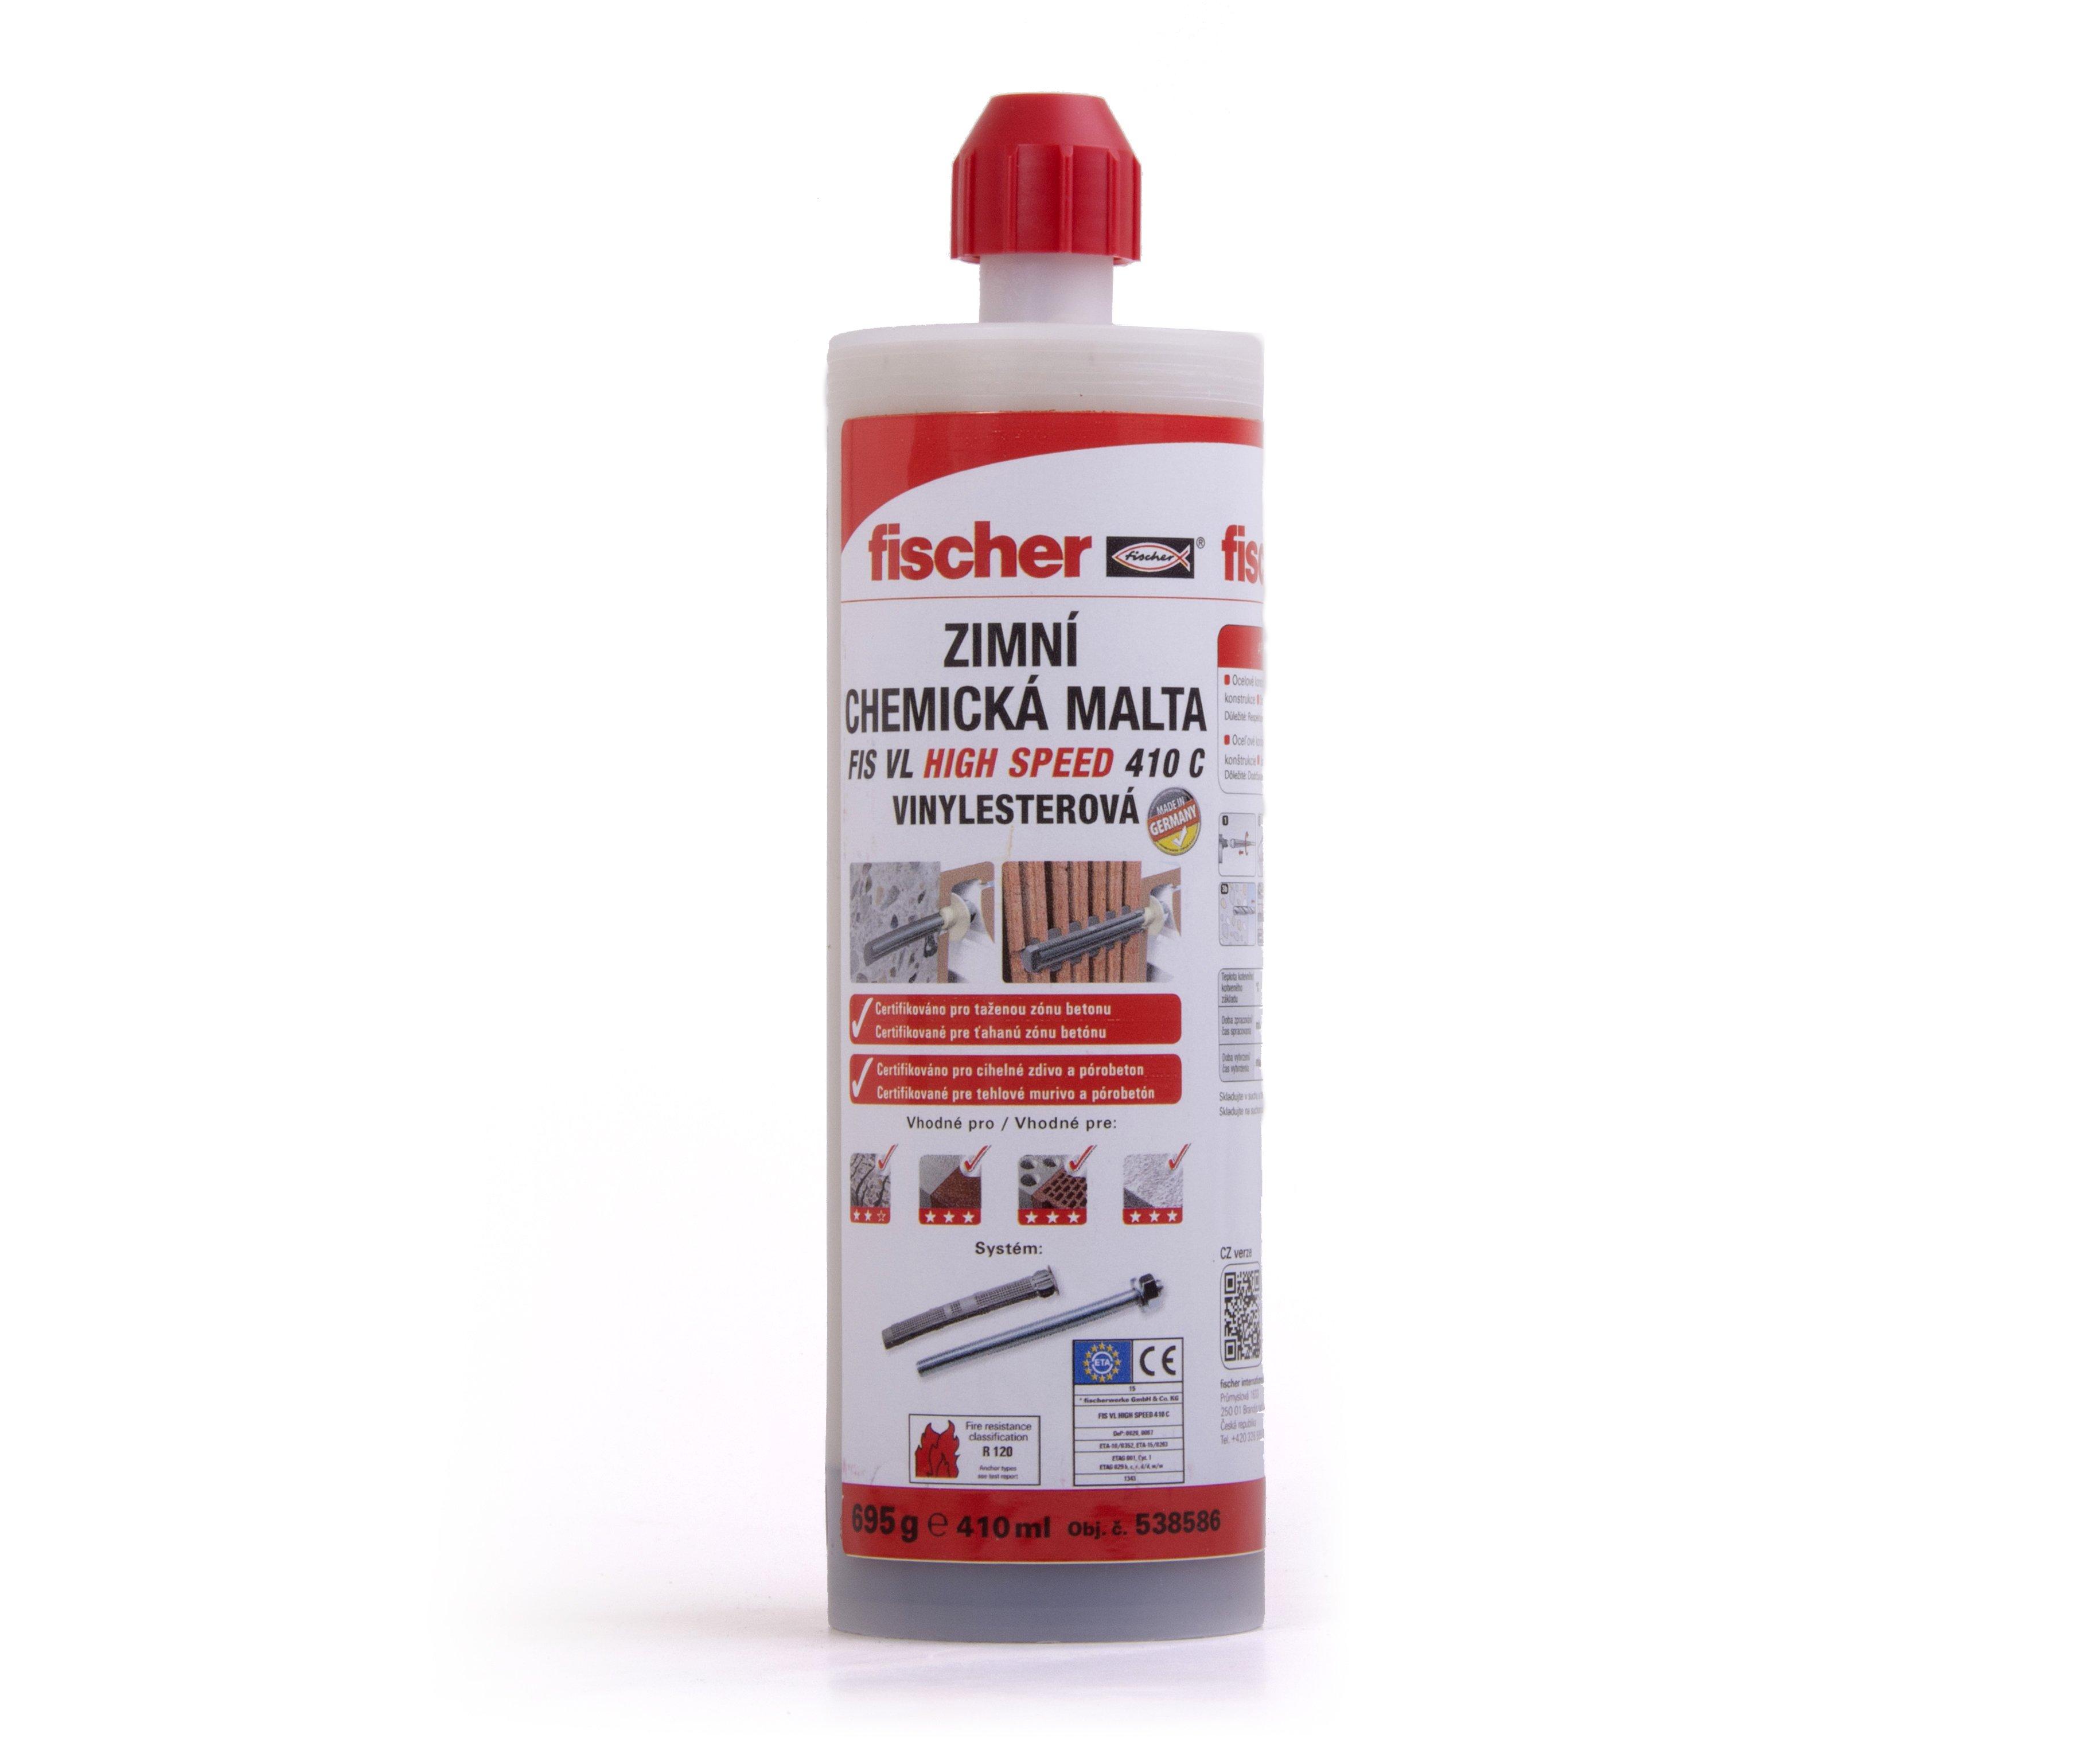 Chemická malta zimní FIS VL 410 C HIGH SPEED Fischer